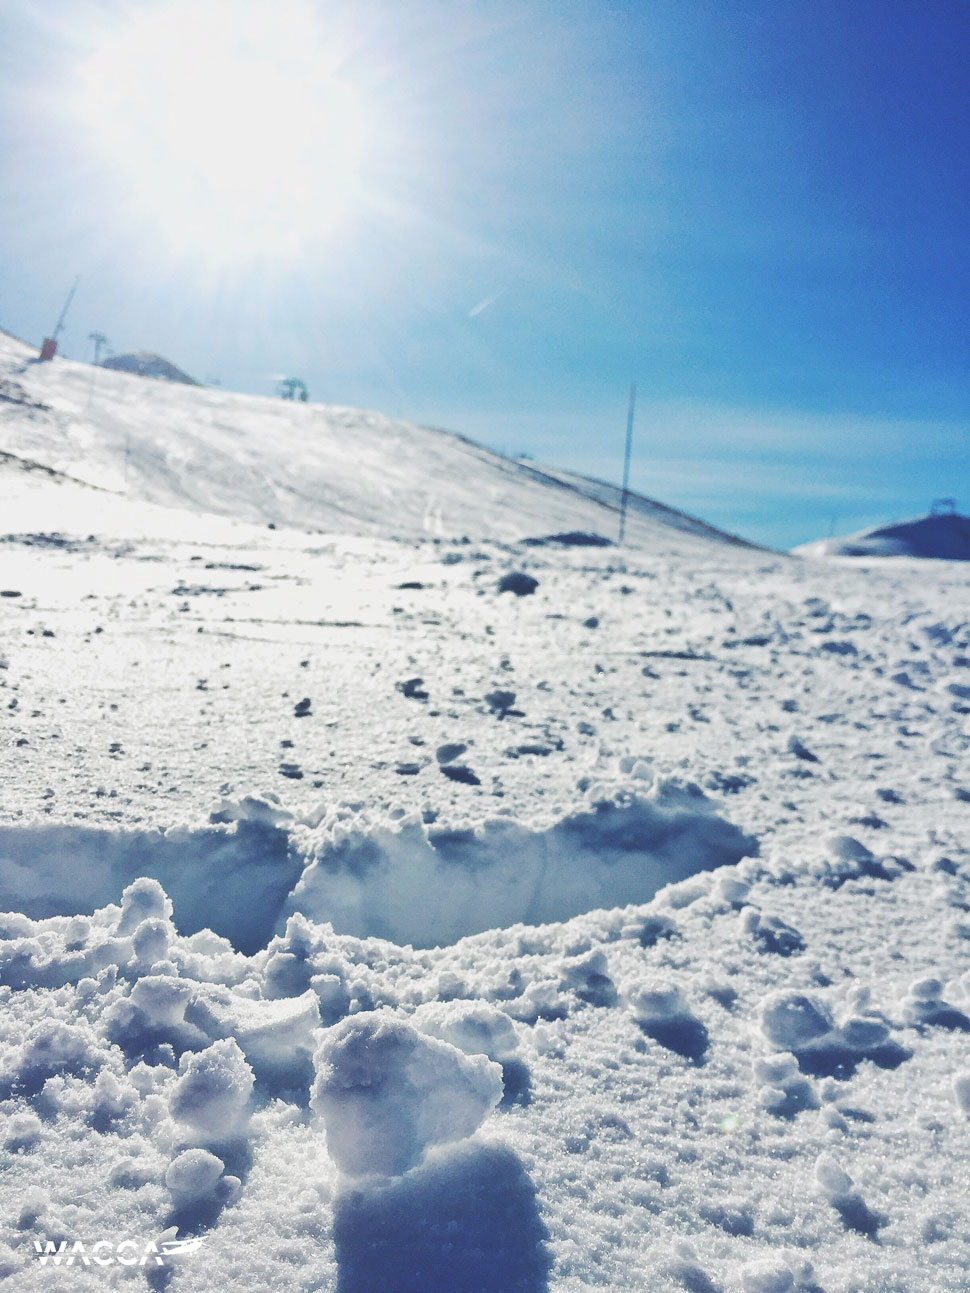 wacca-ski-superdevoluy-08